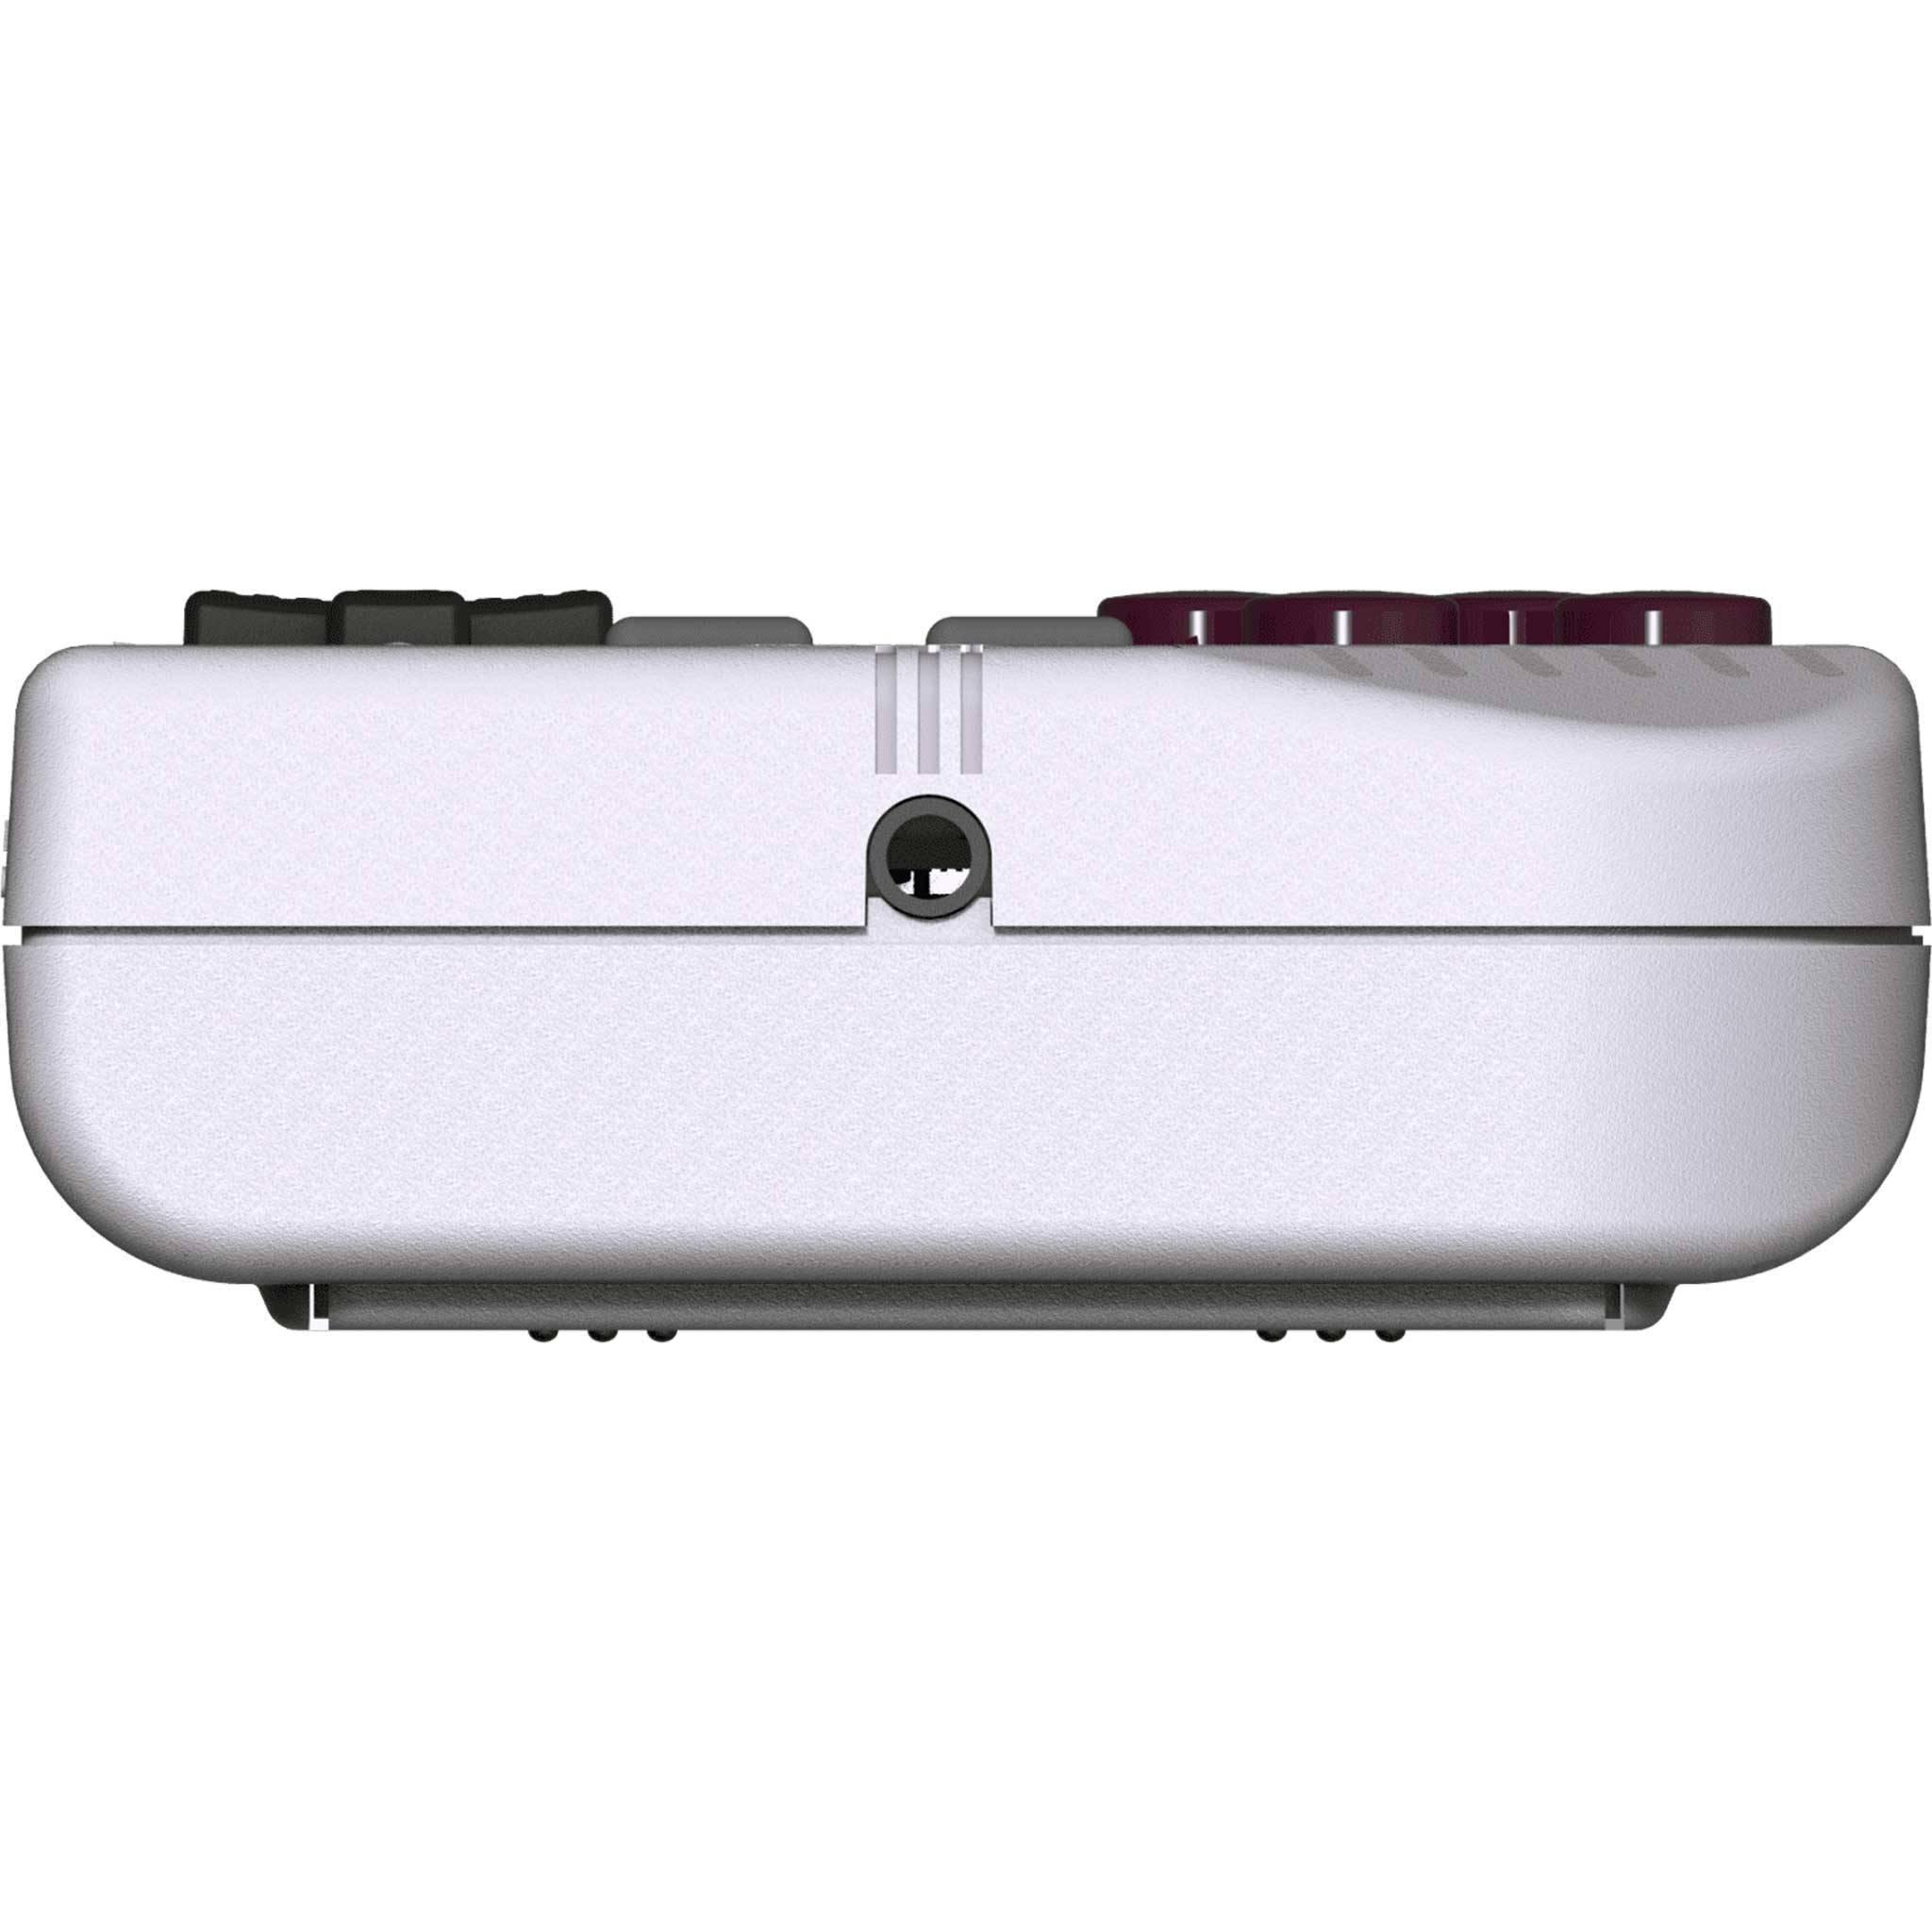 RETROFLAG GPi Case showing Cartridge for Raspberry Pi zero W and 3.5mm headphone jack